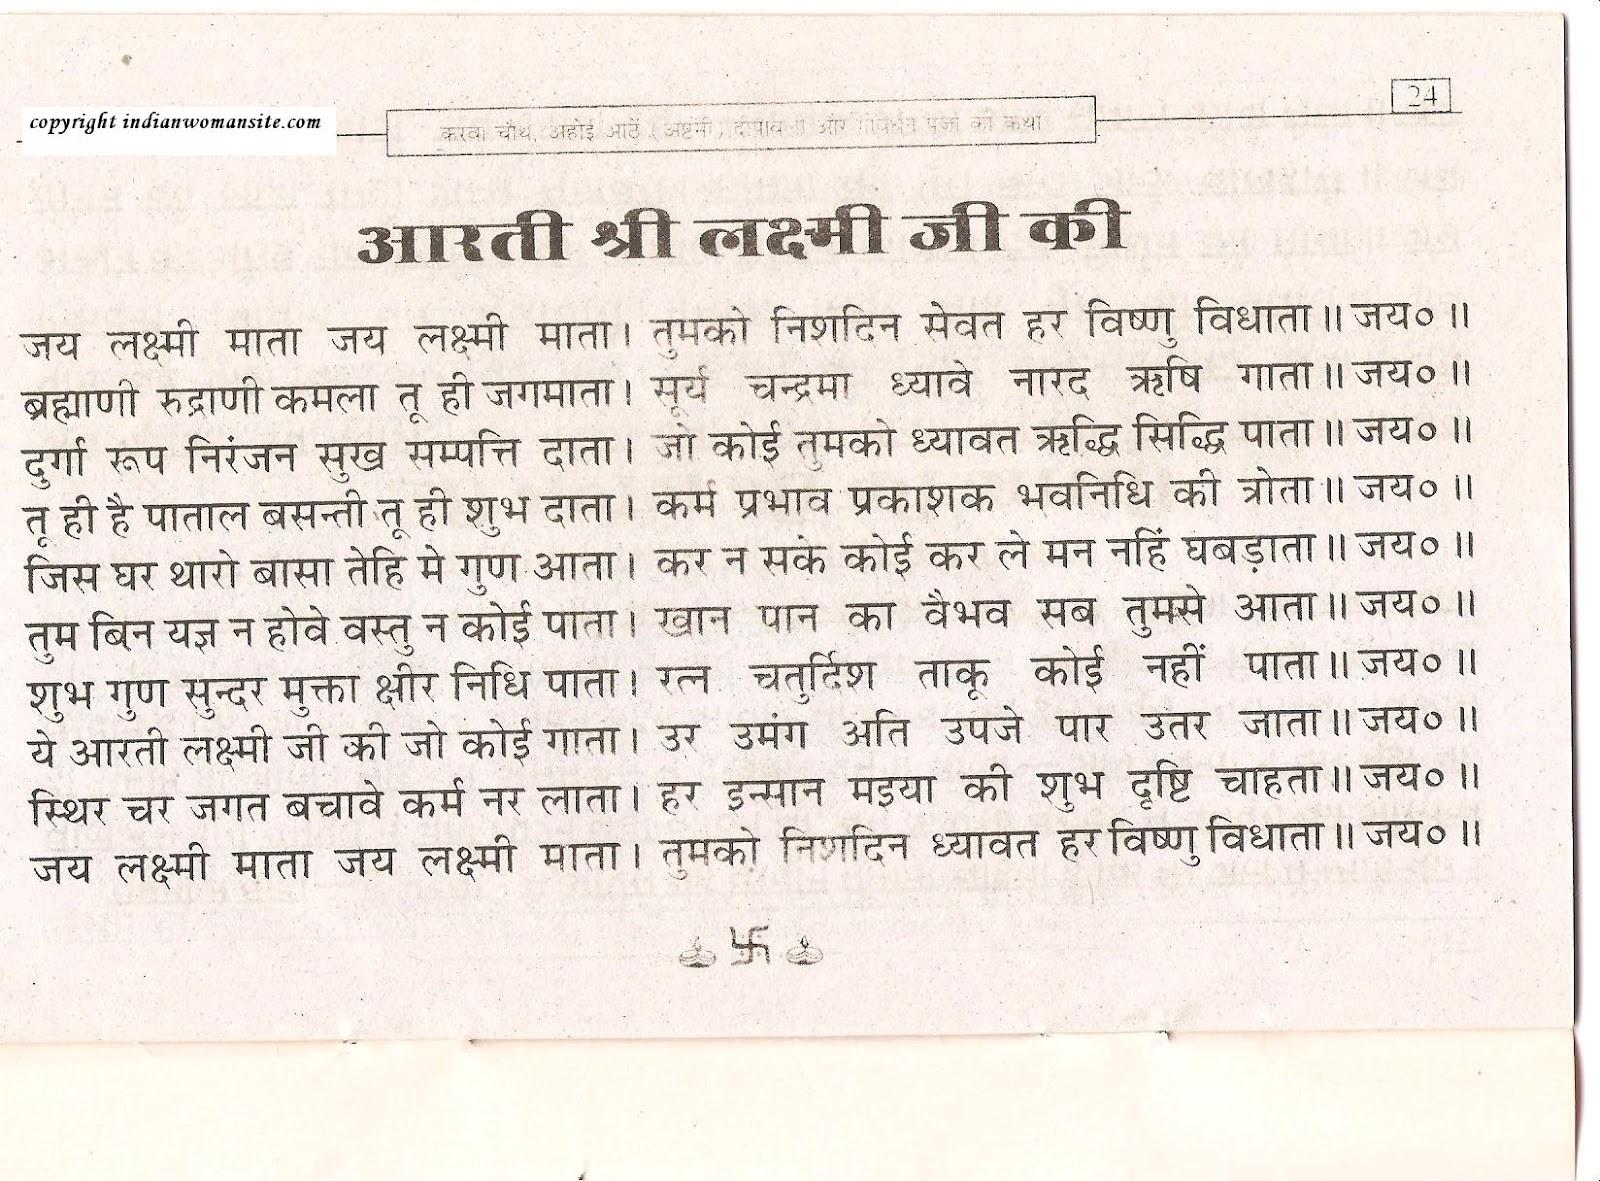 Marathi chavat pdf kamsutra katha